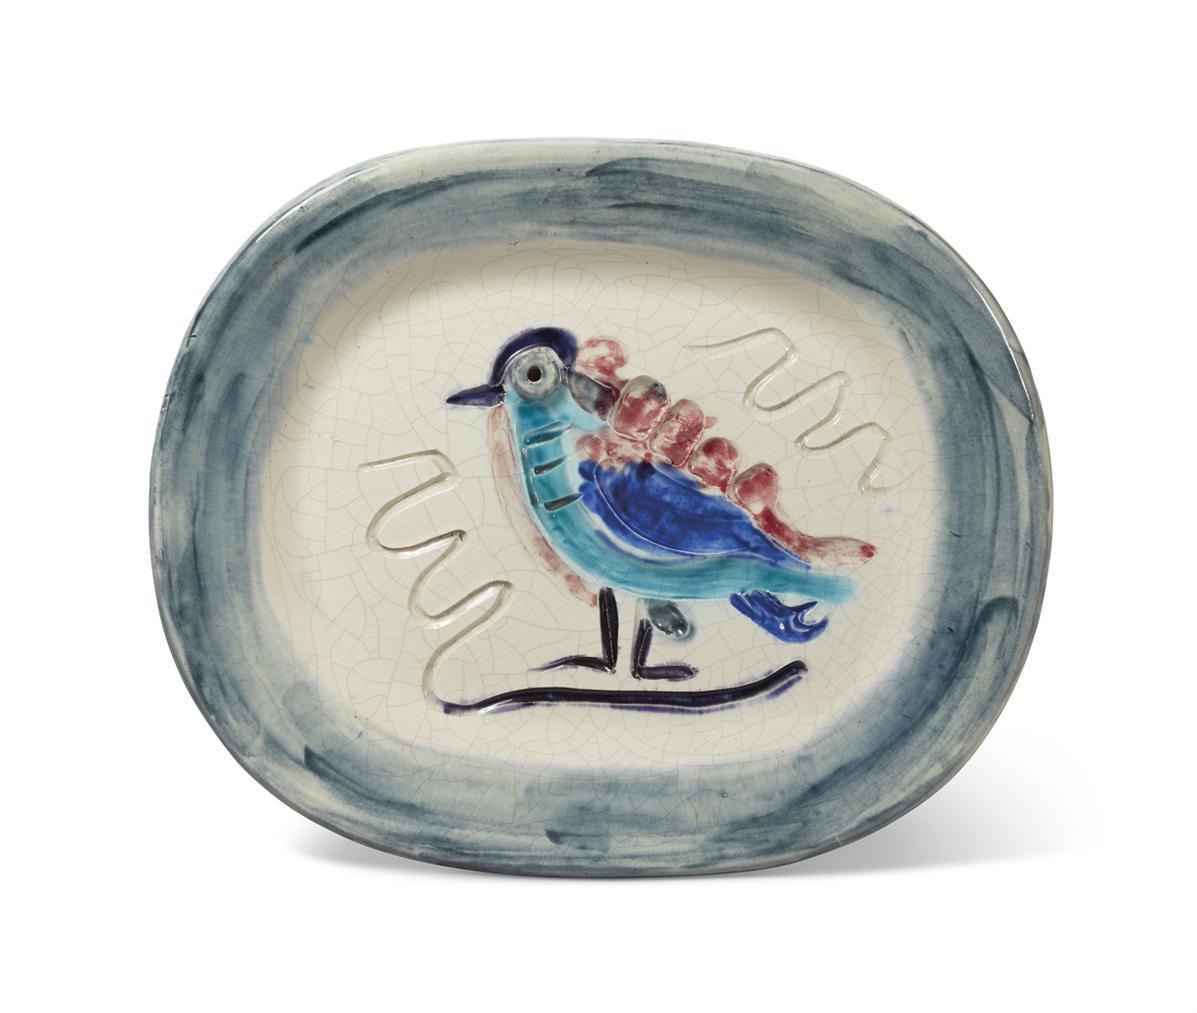 Pablo Picasso-Oiseau Polychrome (A.R. 33)-1947